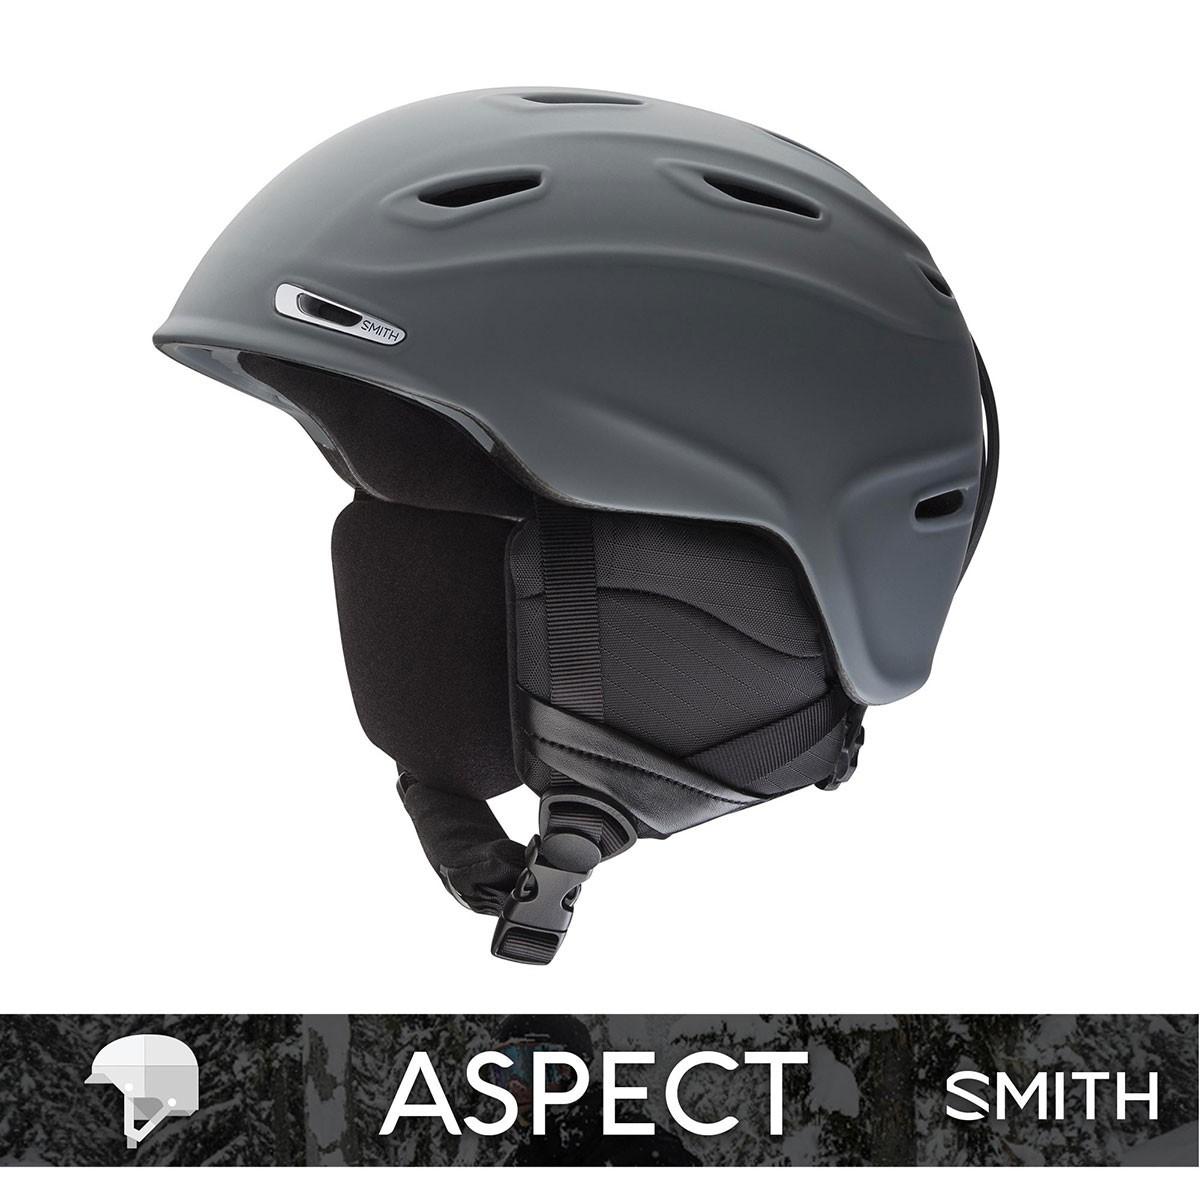 SMITH ASPECT matte Charcoal - Изображение - AQUAMATRIX